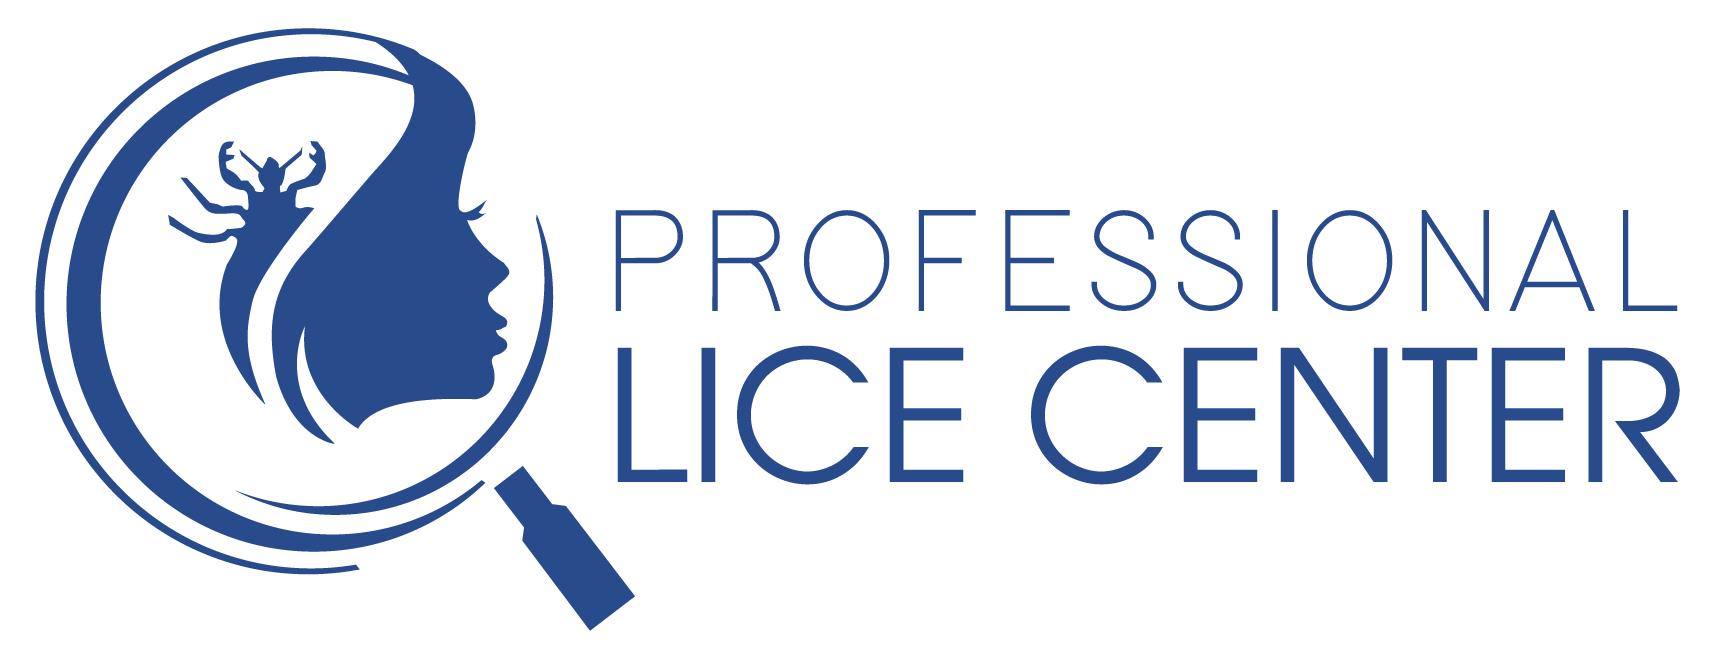 Professional Lice Center LLC